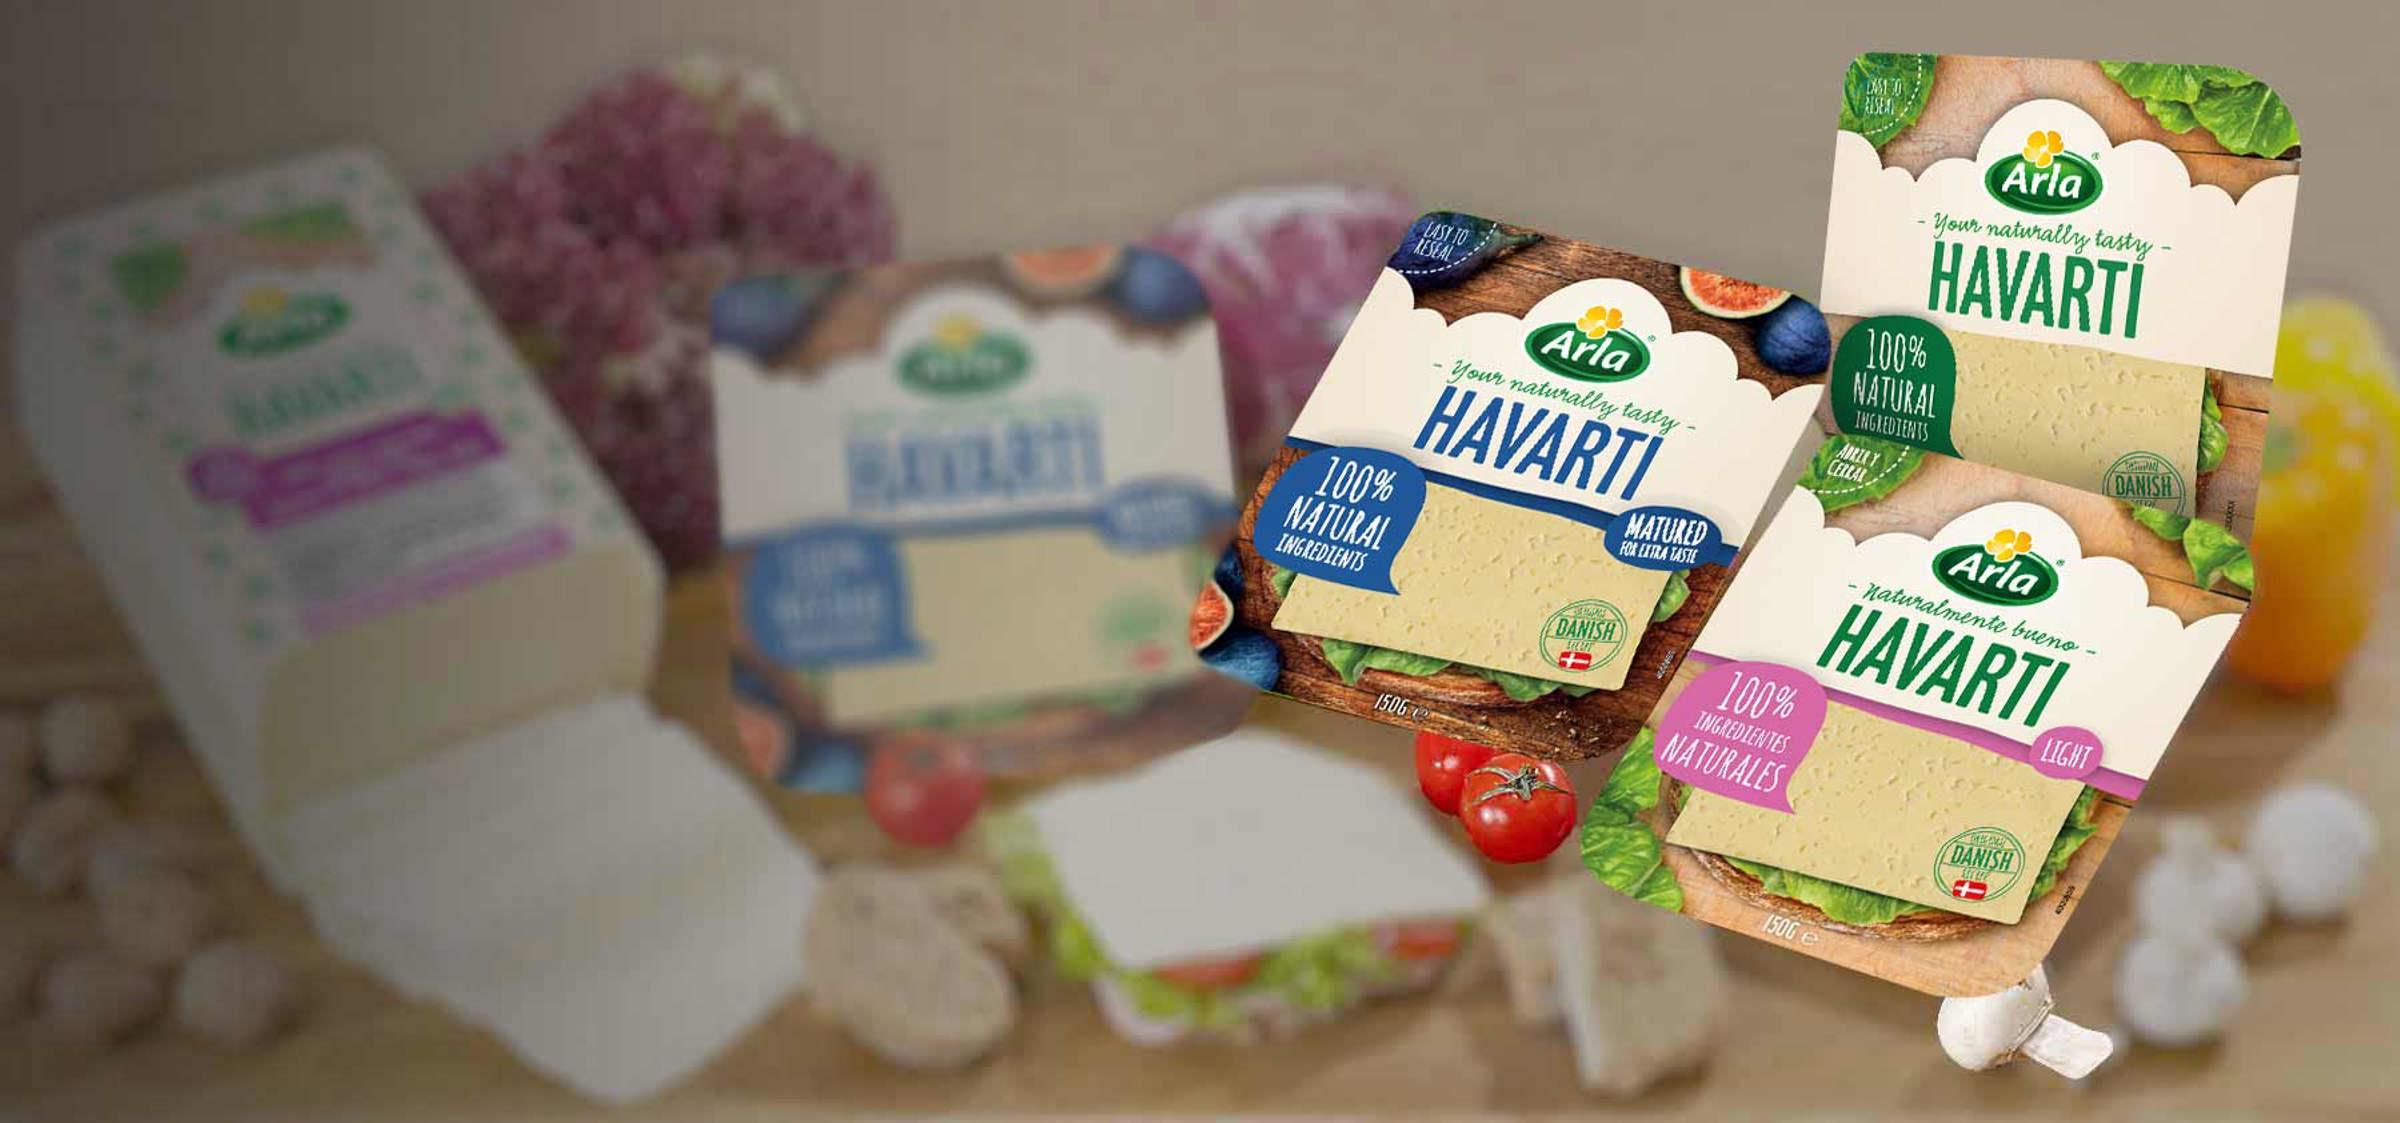 Arla Foods, Arla Havarti, Προϊόντα Arla